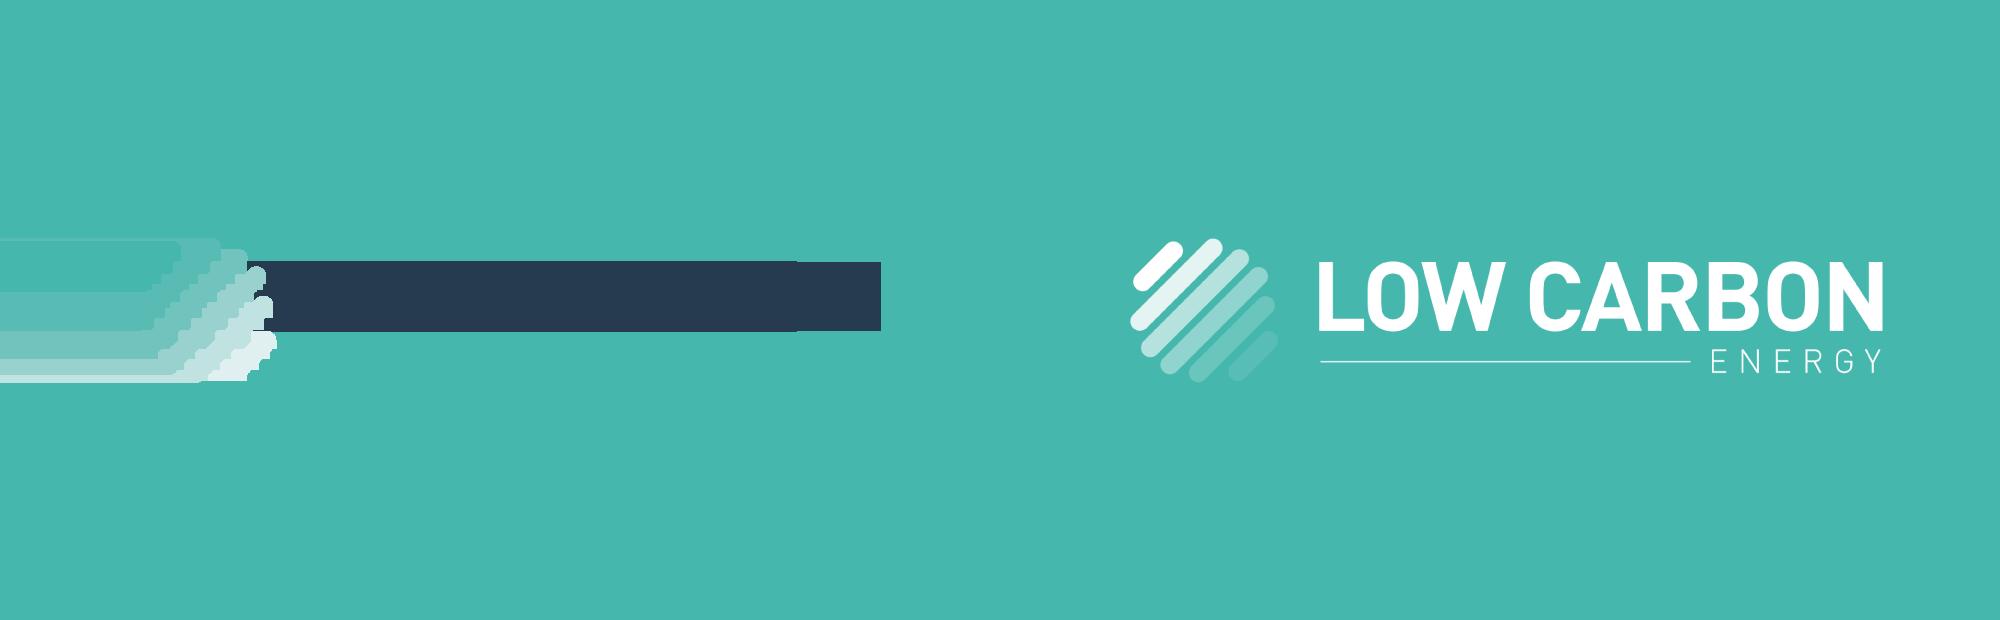 Low Carbon Energy - Branding